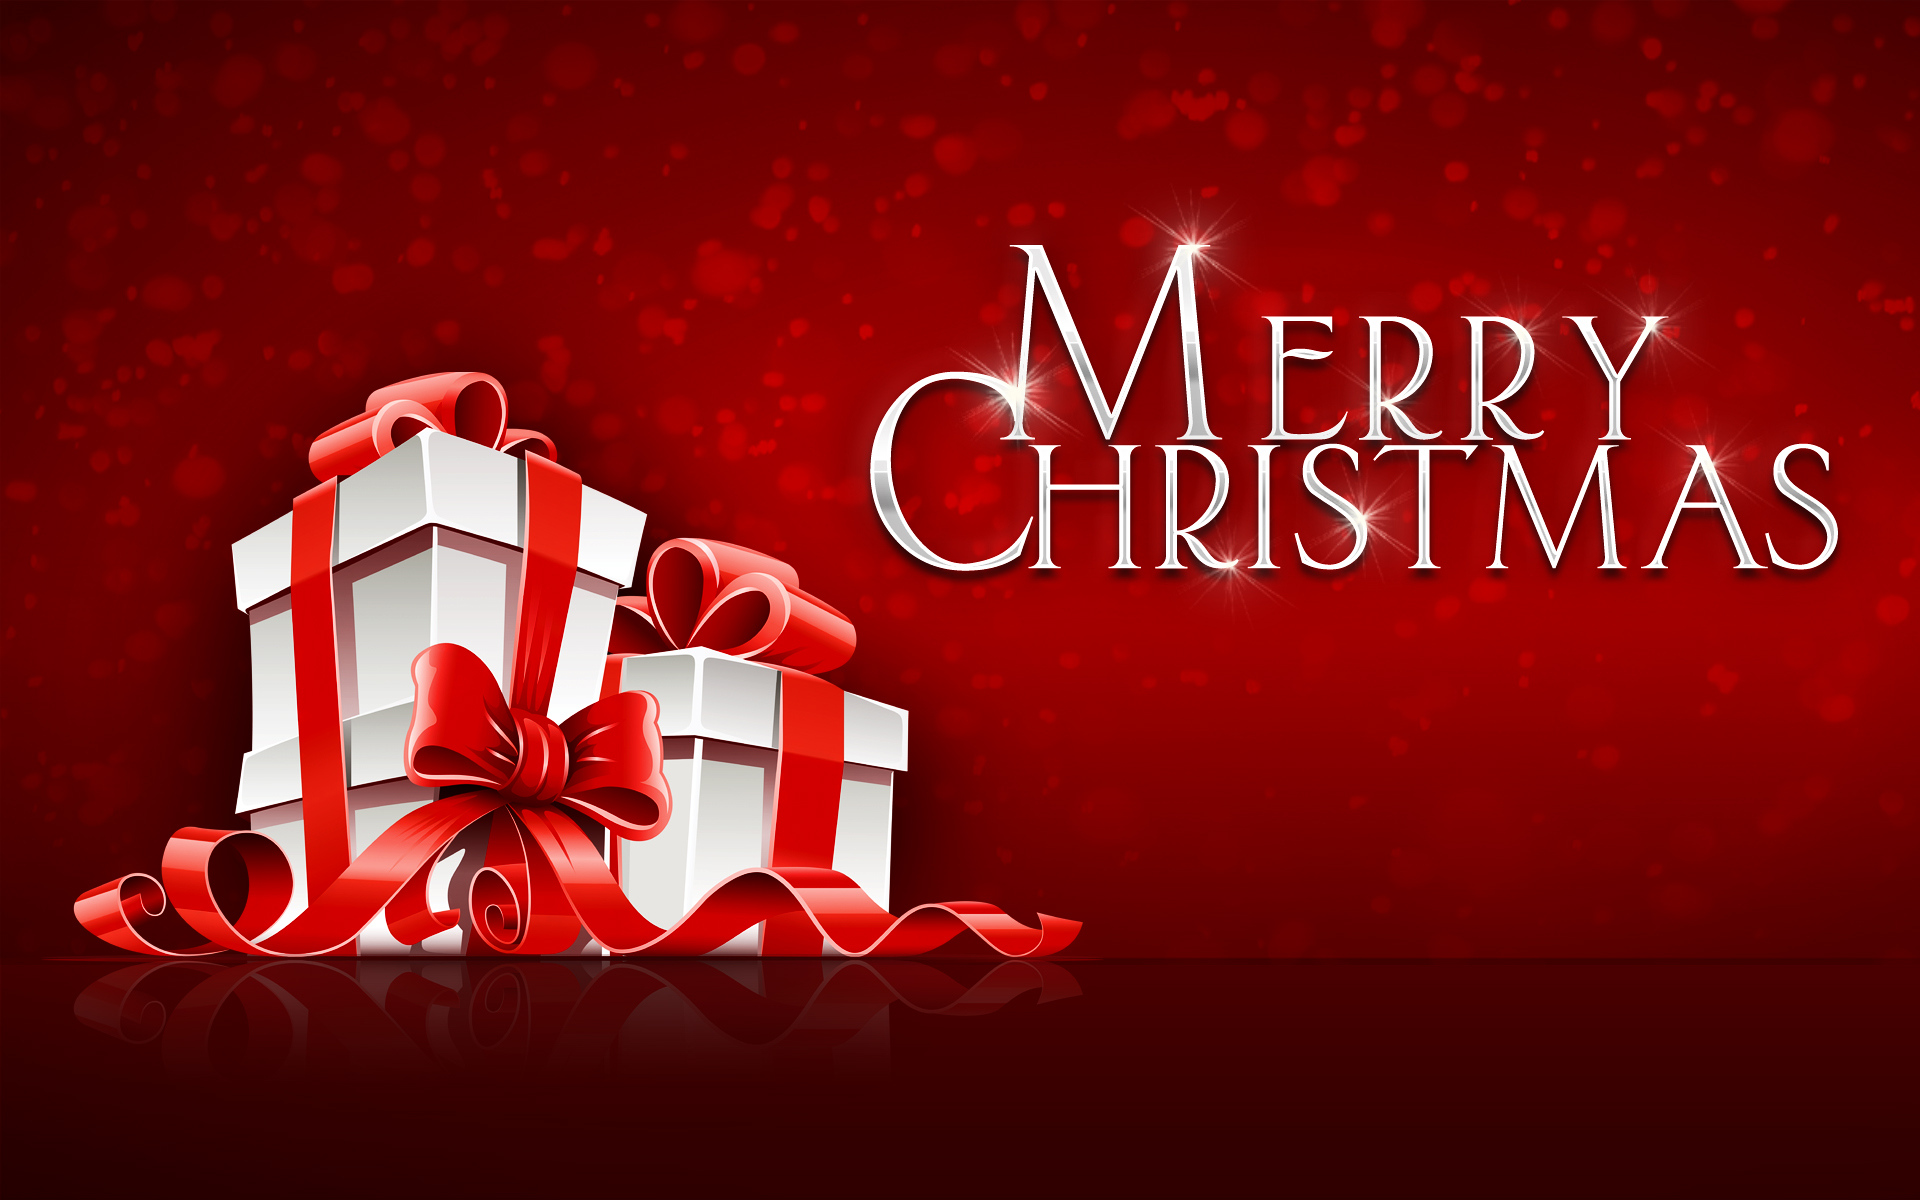 beautiful-merry-christmas-hd-wallpaper